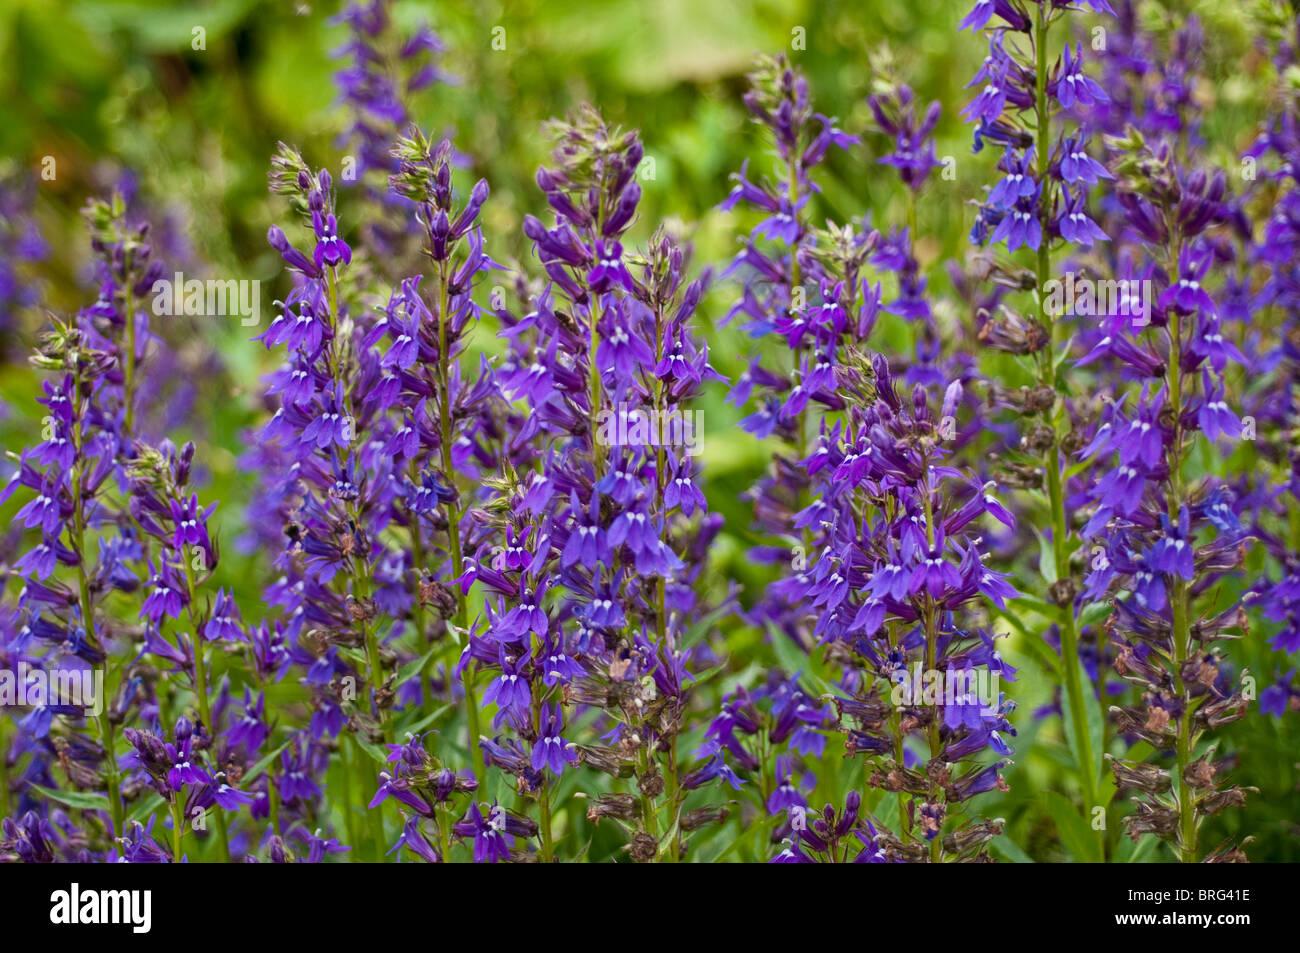 Lobelia X Speciosa Vedrariensis Flowers Stock Photo 31701866 Alamy